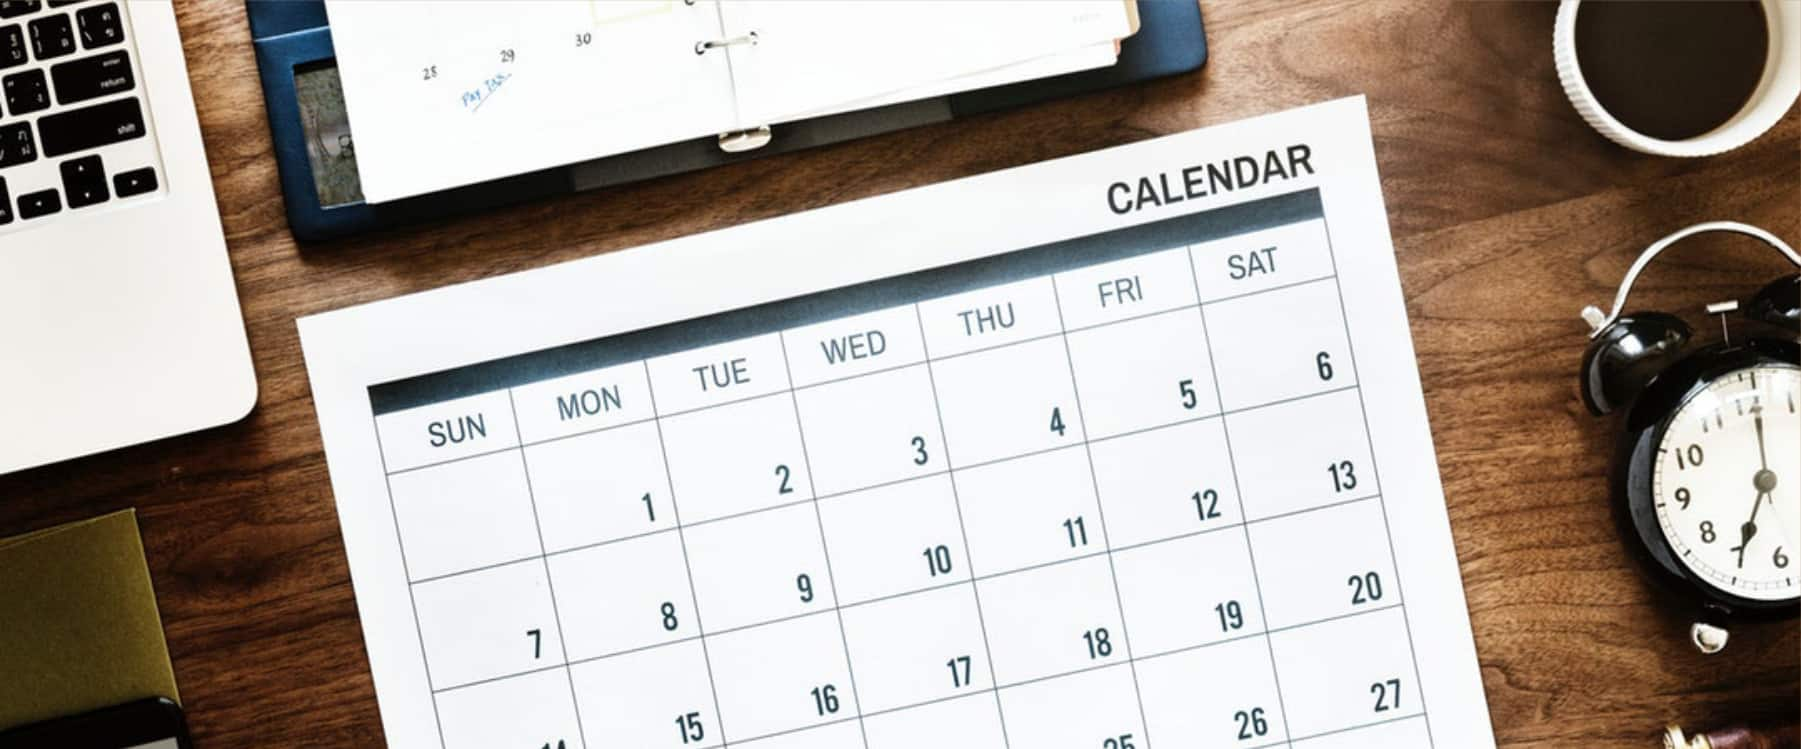 ACEONDO Revised Academic Calendar 2021